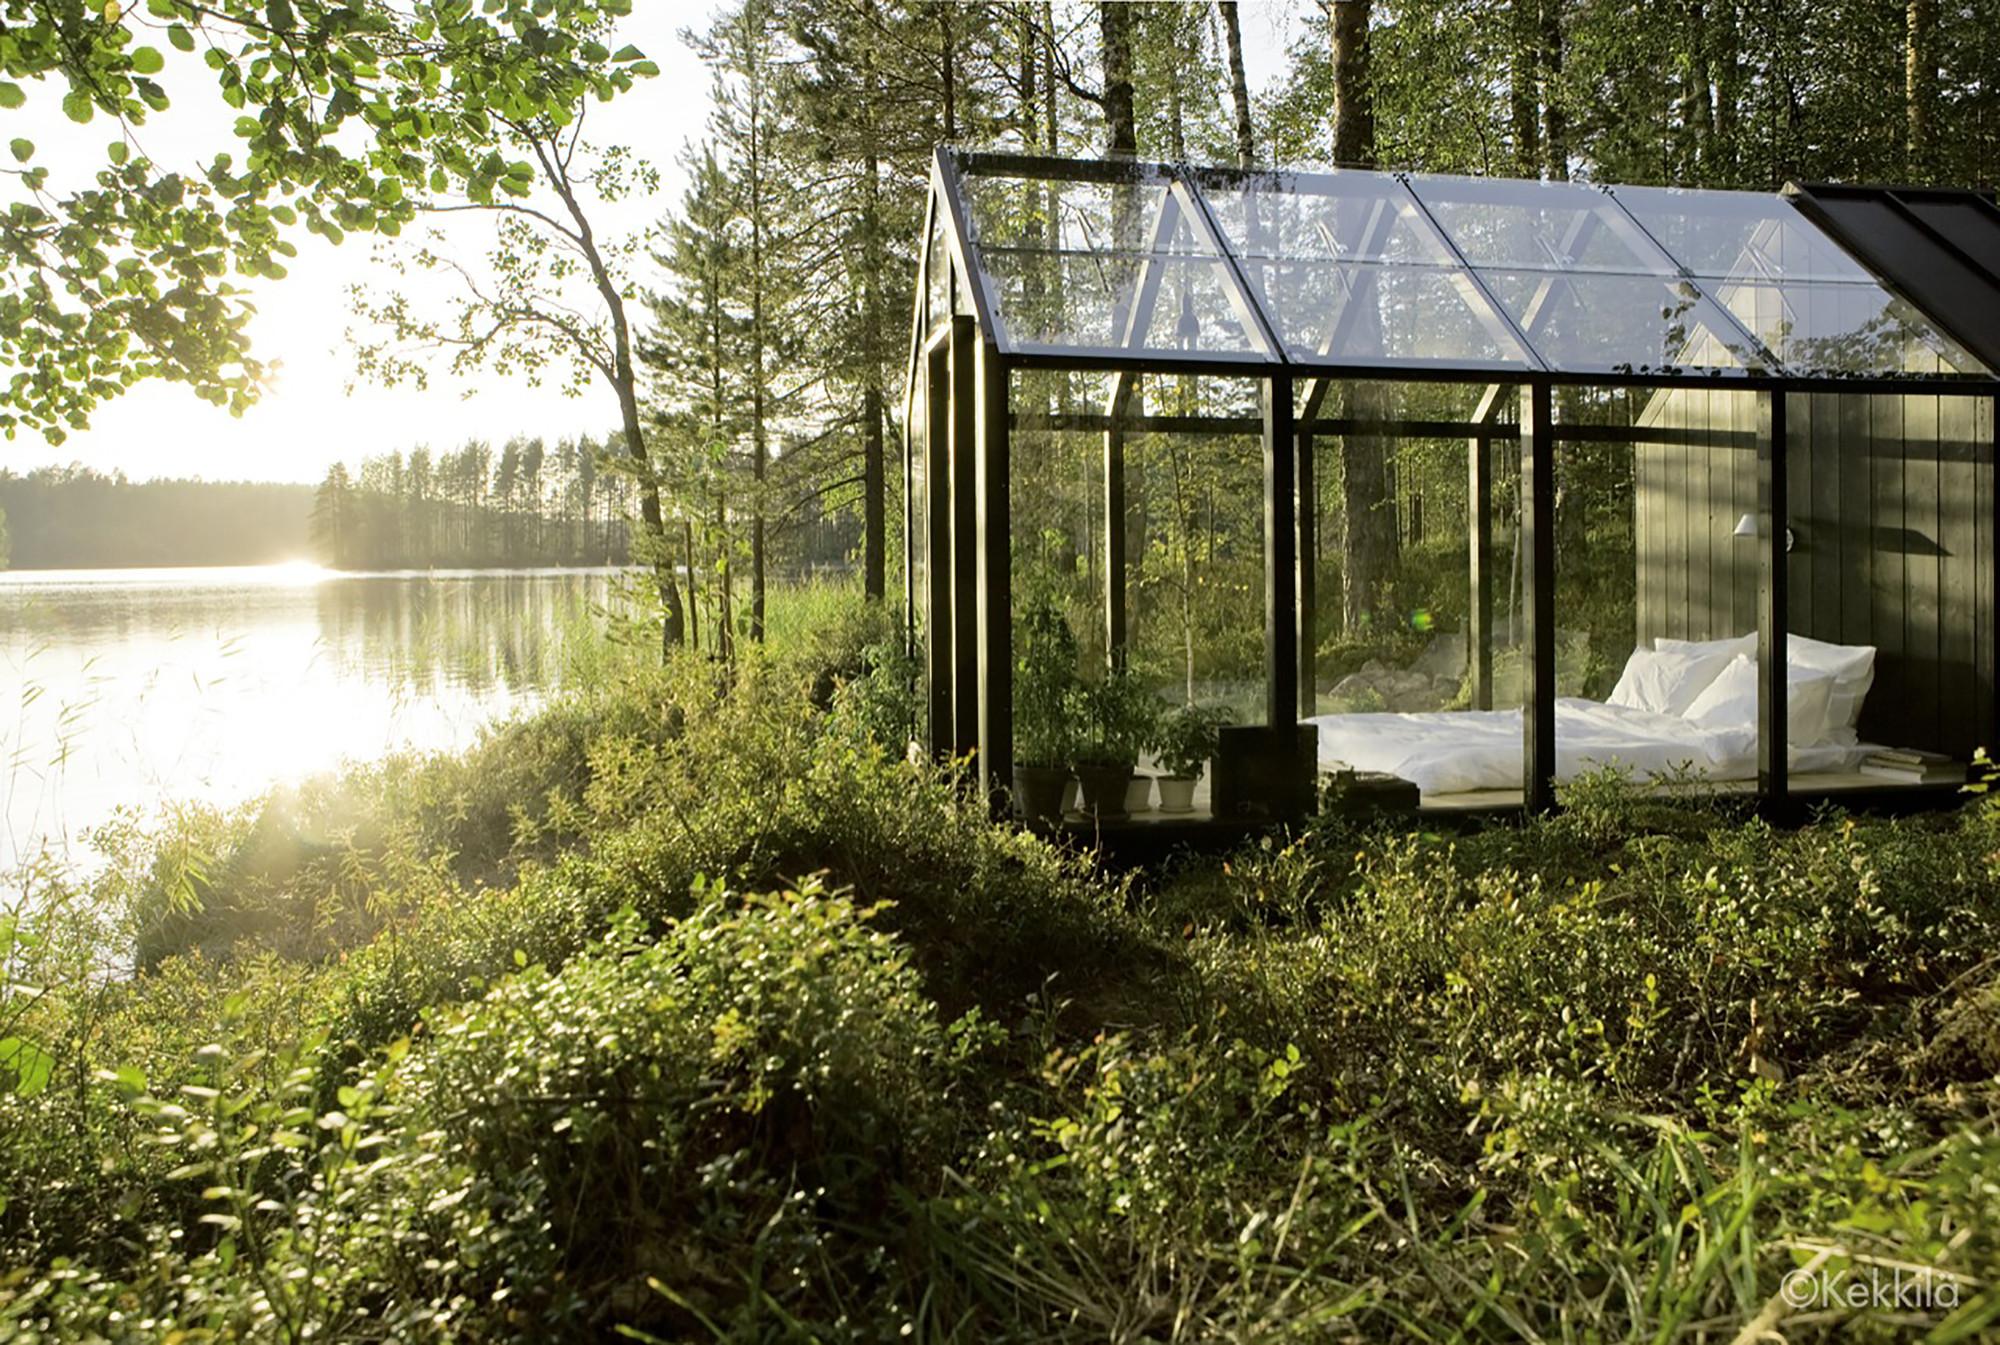 Kekkilä Green Shed  / Linda Bergroth  + Ville Hara, Courtesy of Linda Bergroth